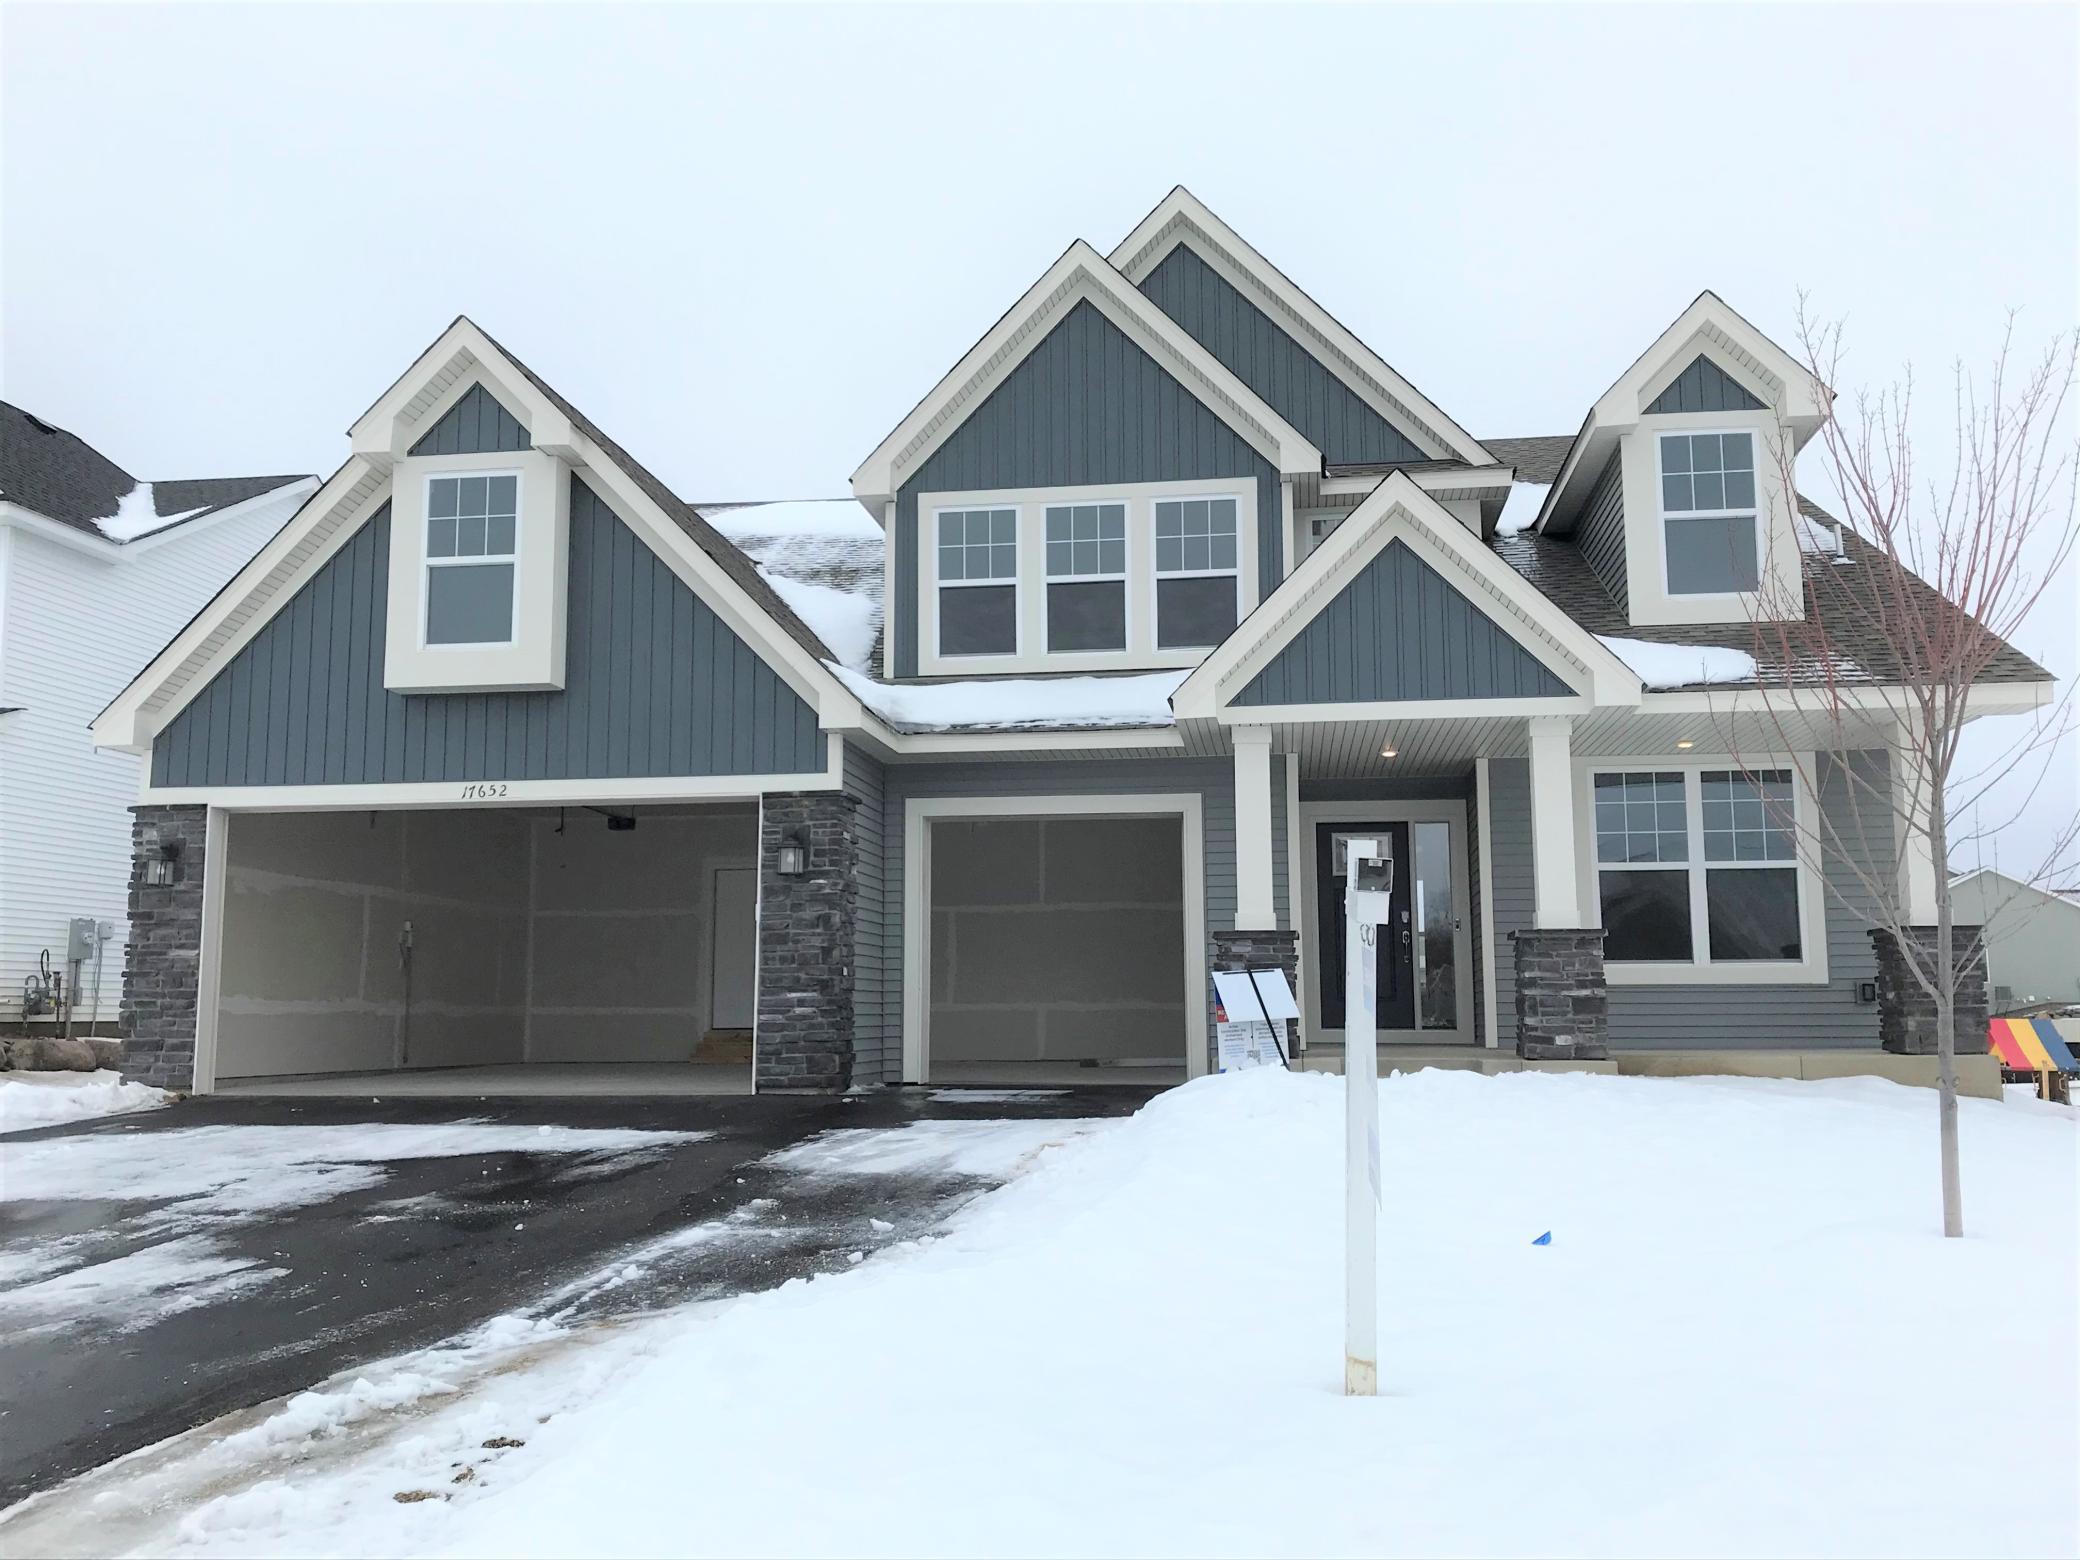 17652 51st. Street NE Property Photo - Otsego, MN real estate listing